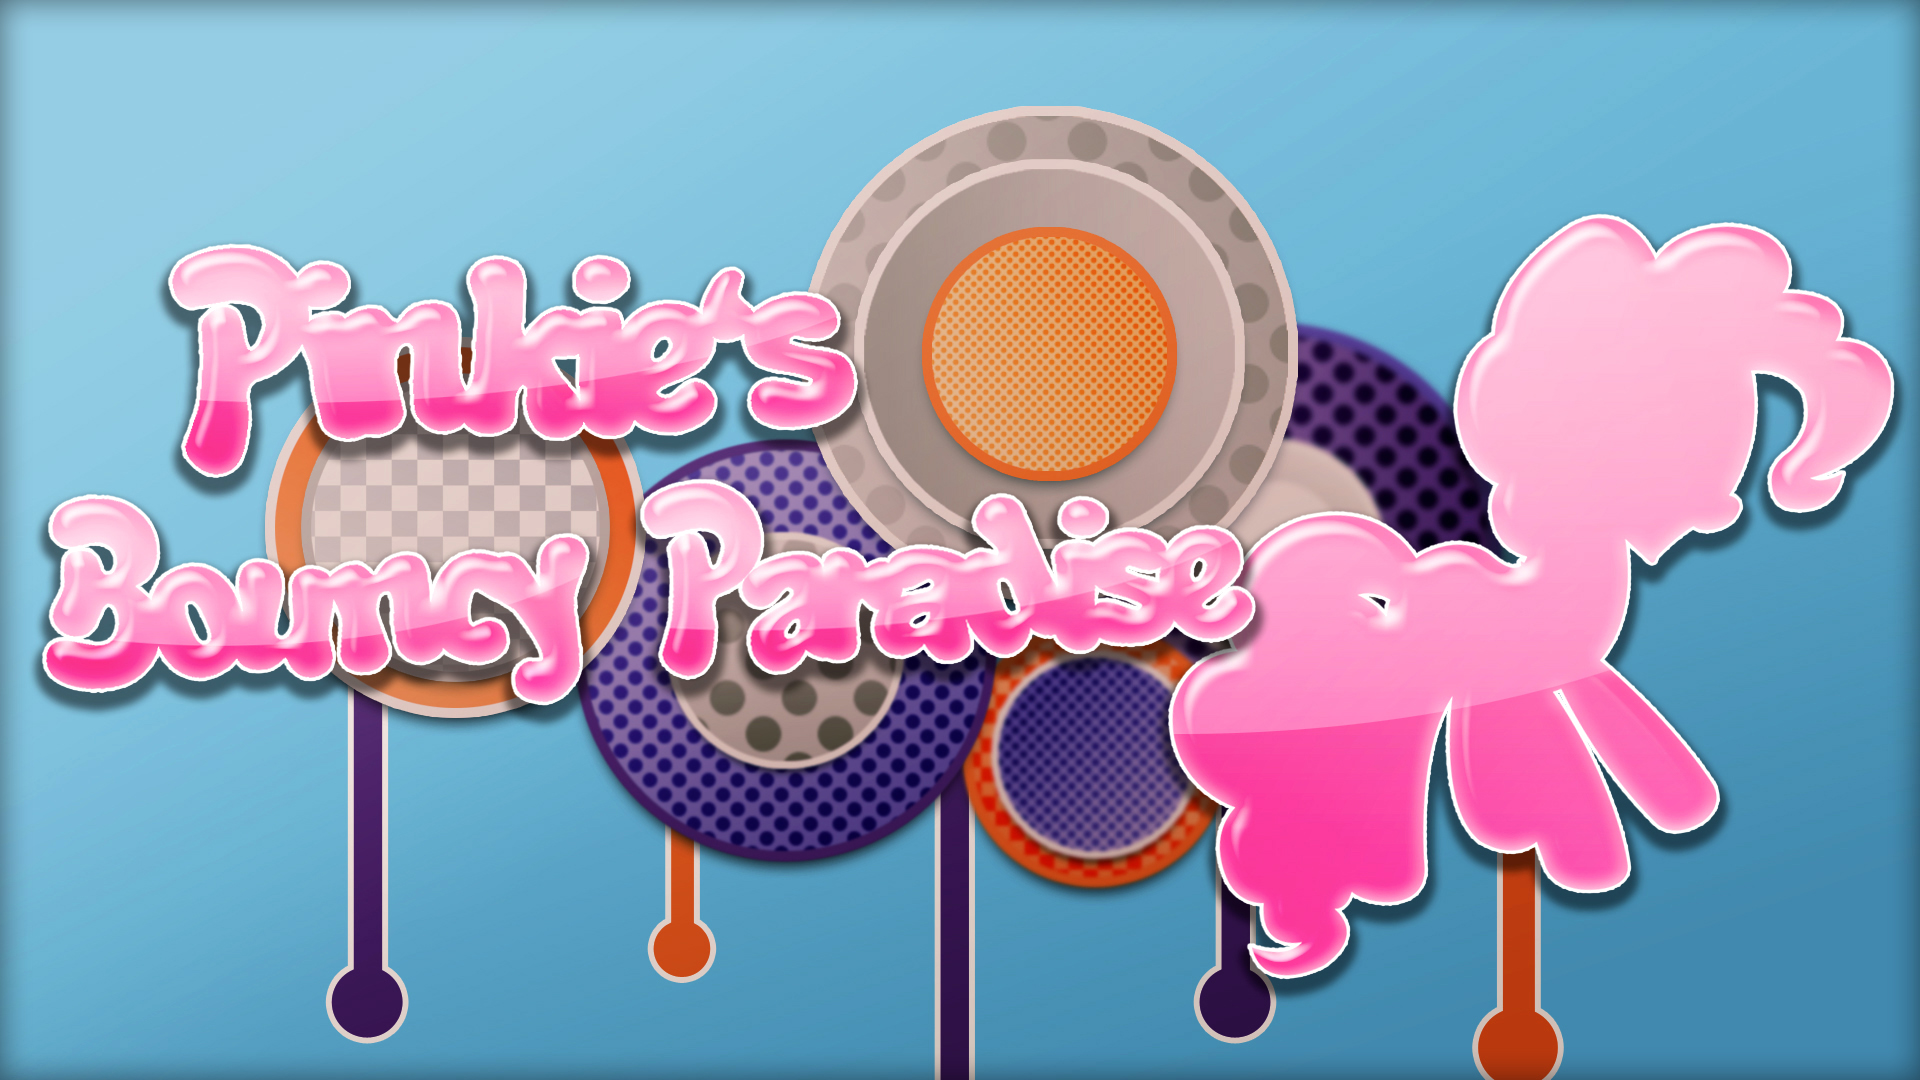 Pinkie's Bouncy Paradise by InternationalTCK